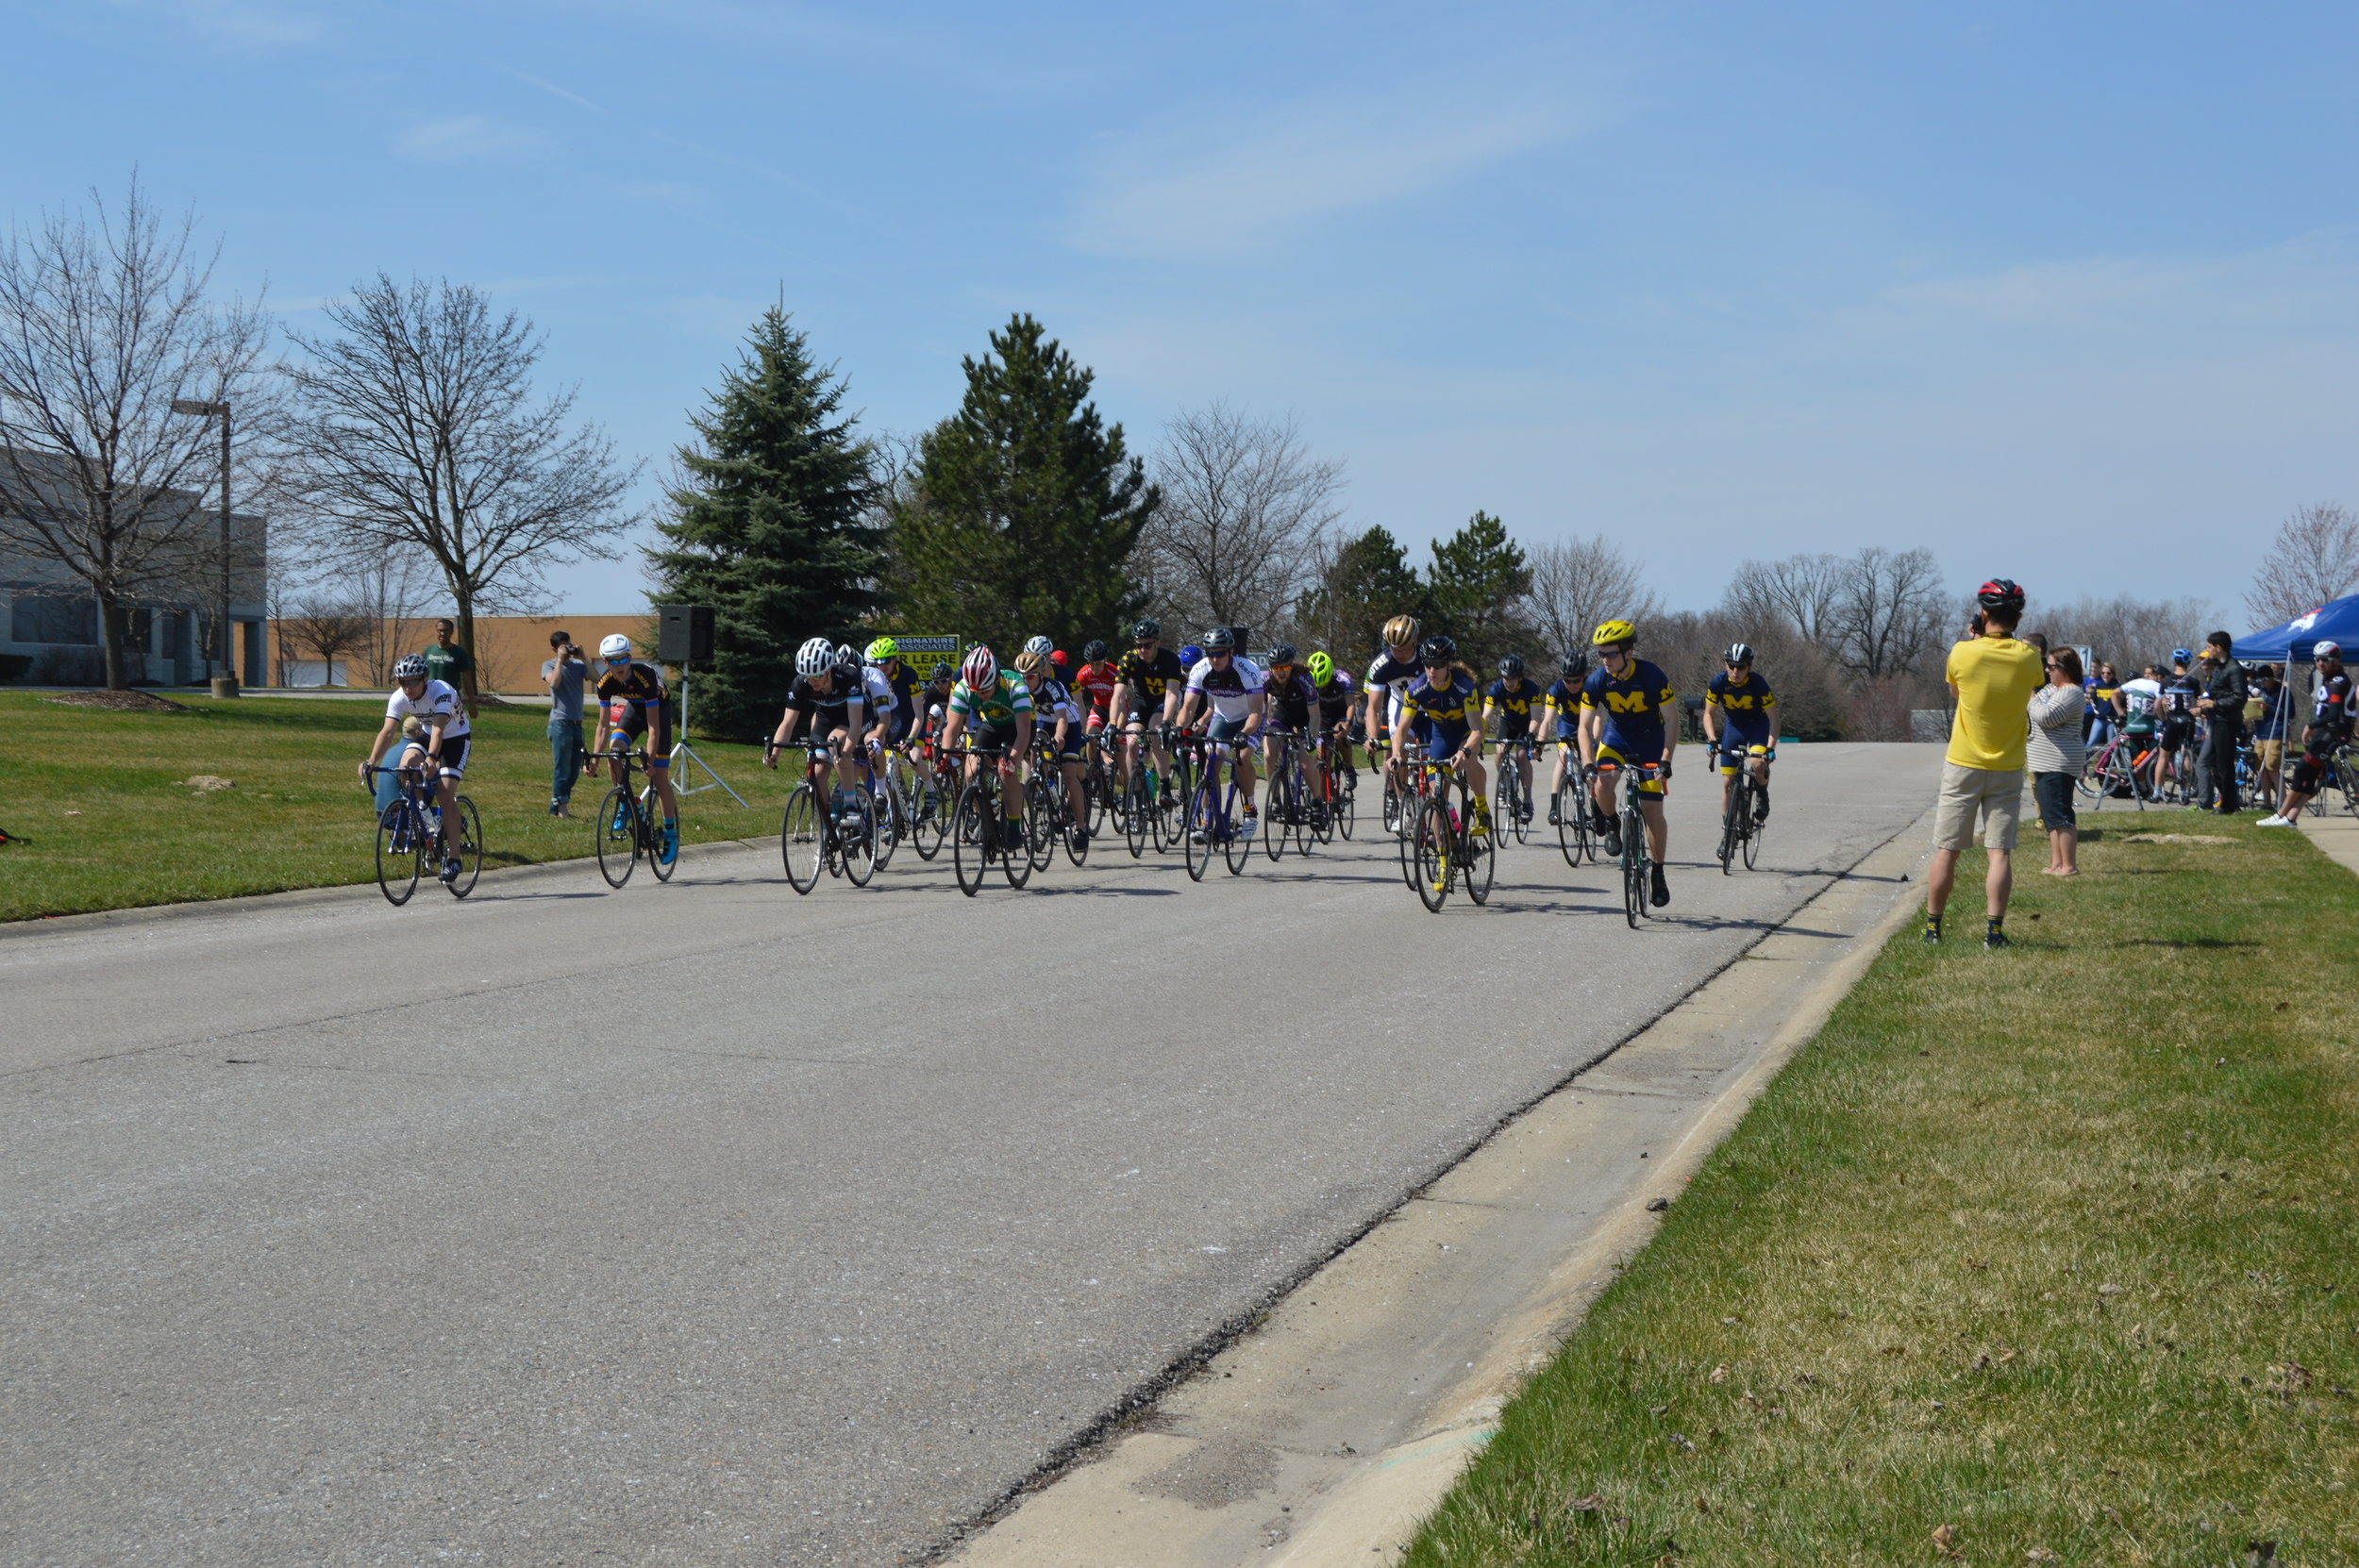 Starting line at the University of Michigan Criterium